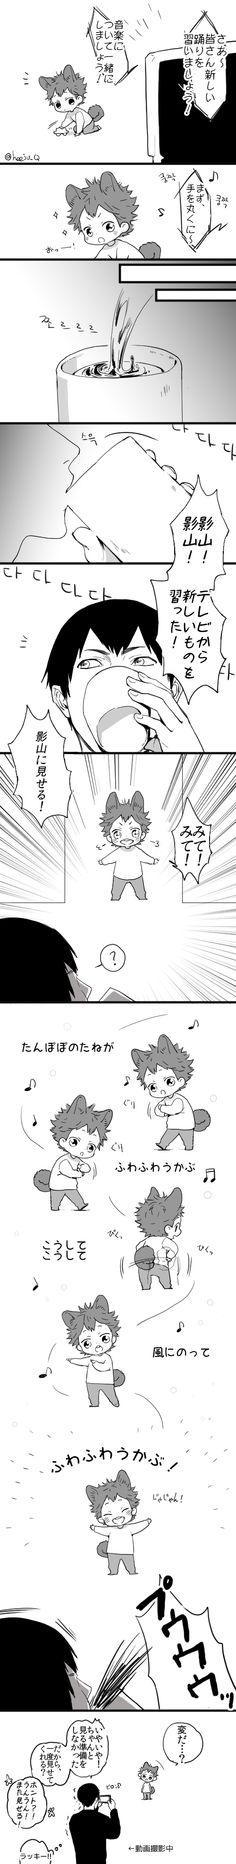 A dancinha do Hinata ♥♥♥